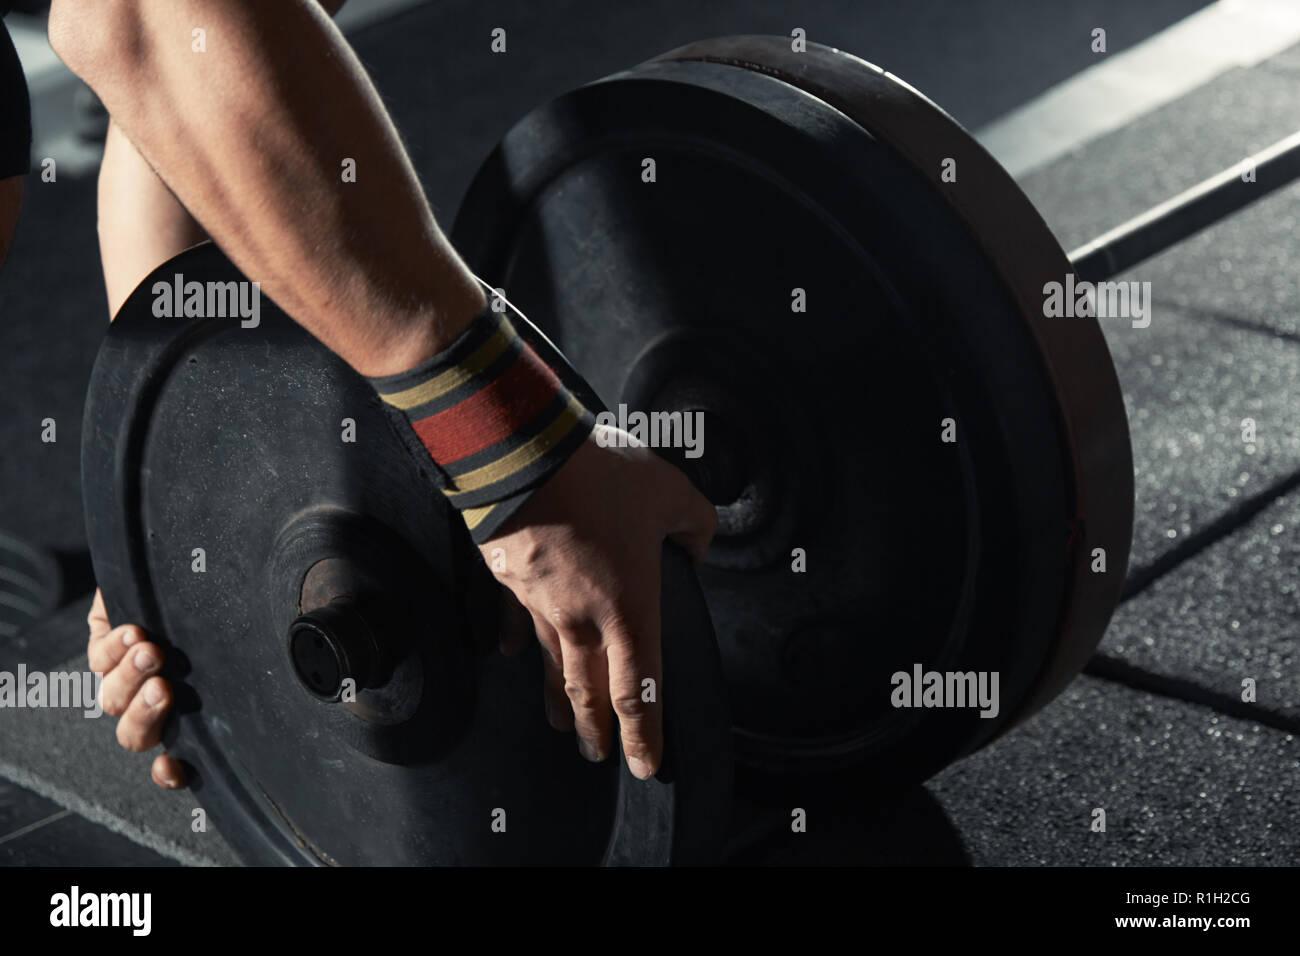 Man preparing barbell at fitness club - Stock Image